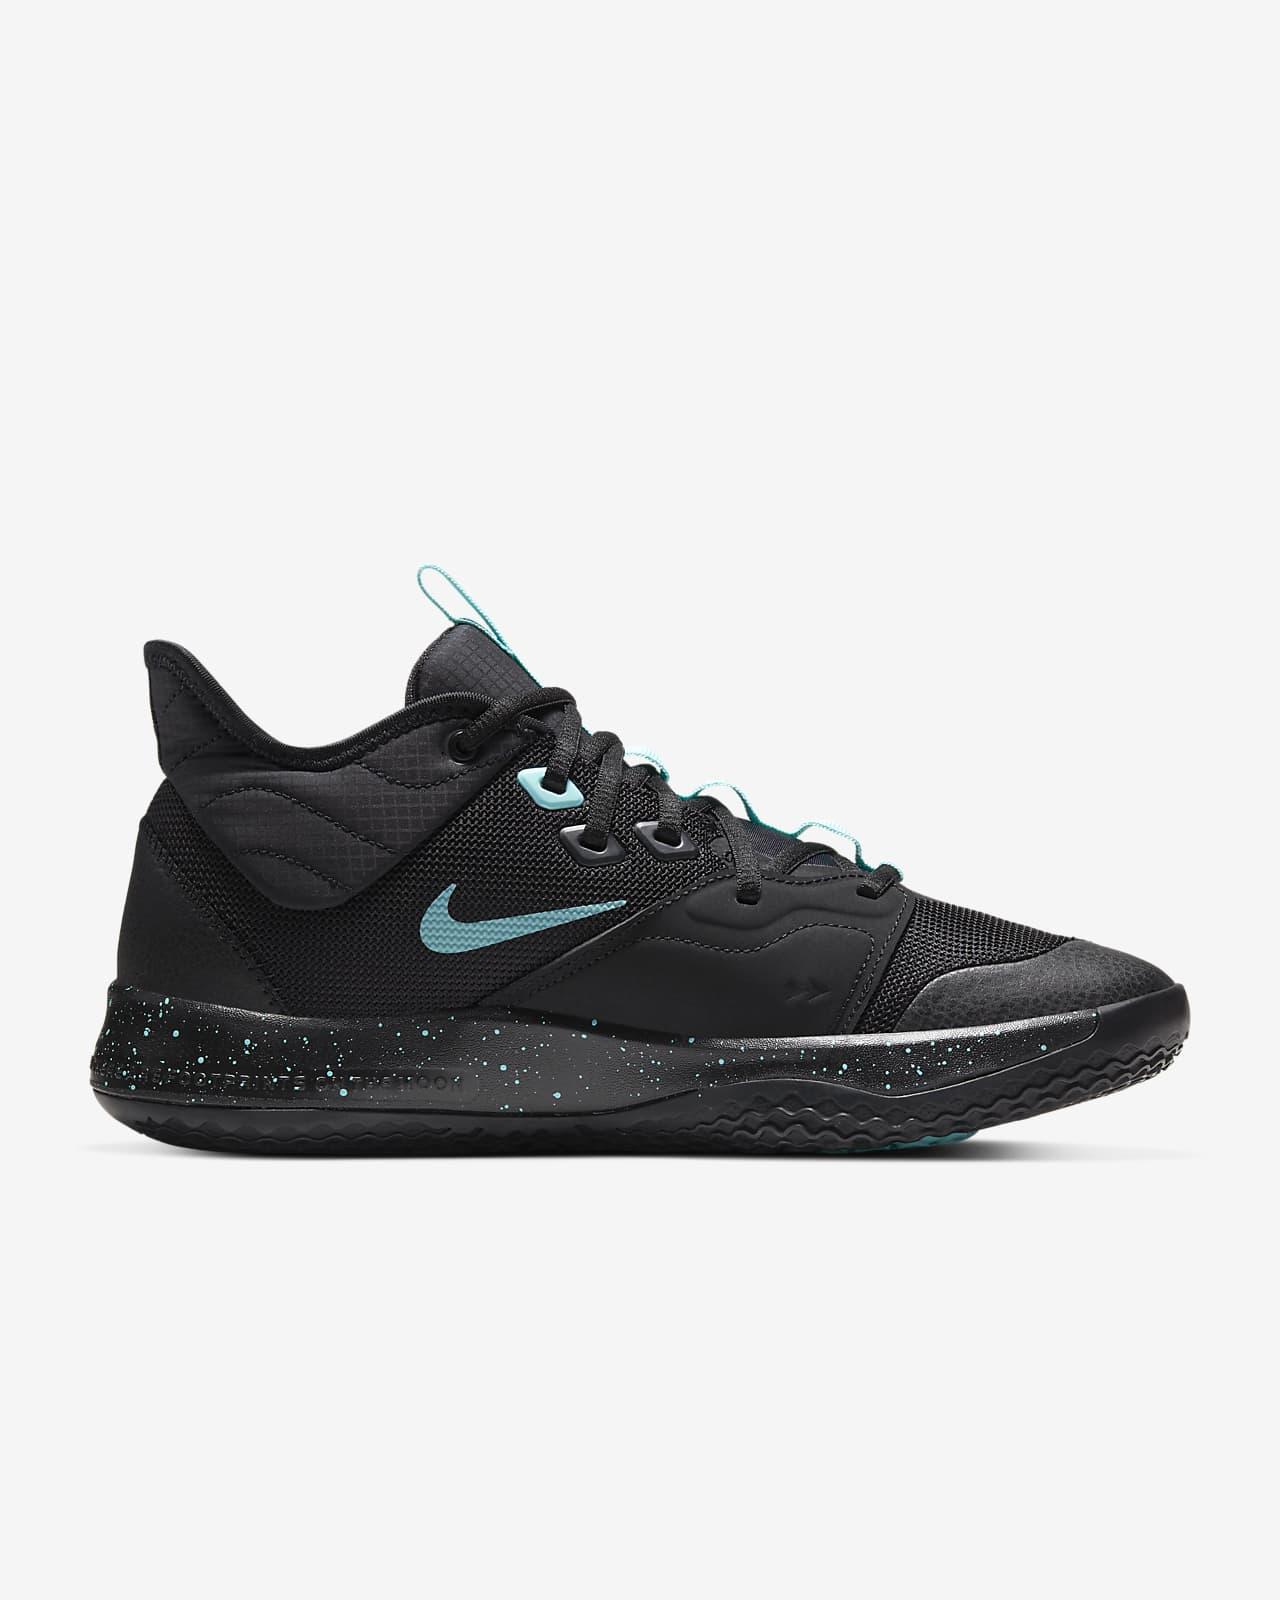 PG 3 Basketball Shoe. Nike SG